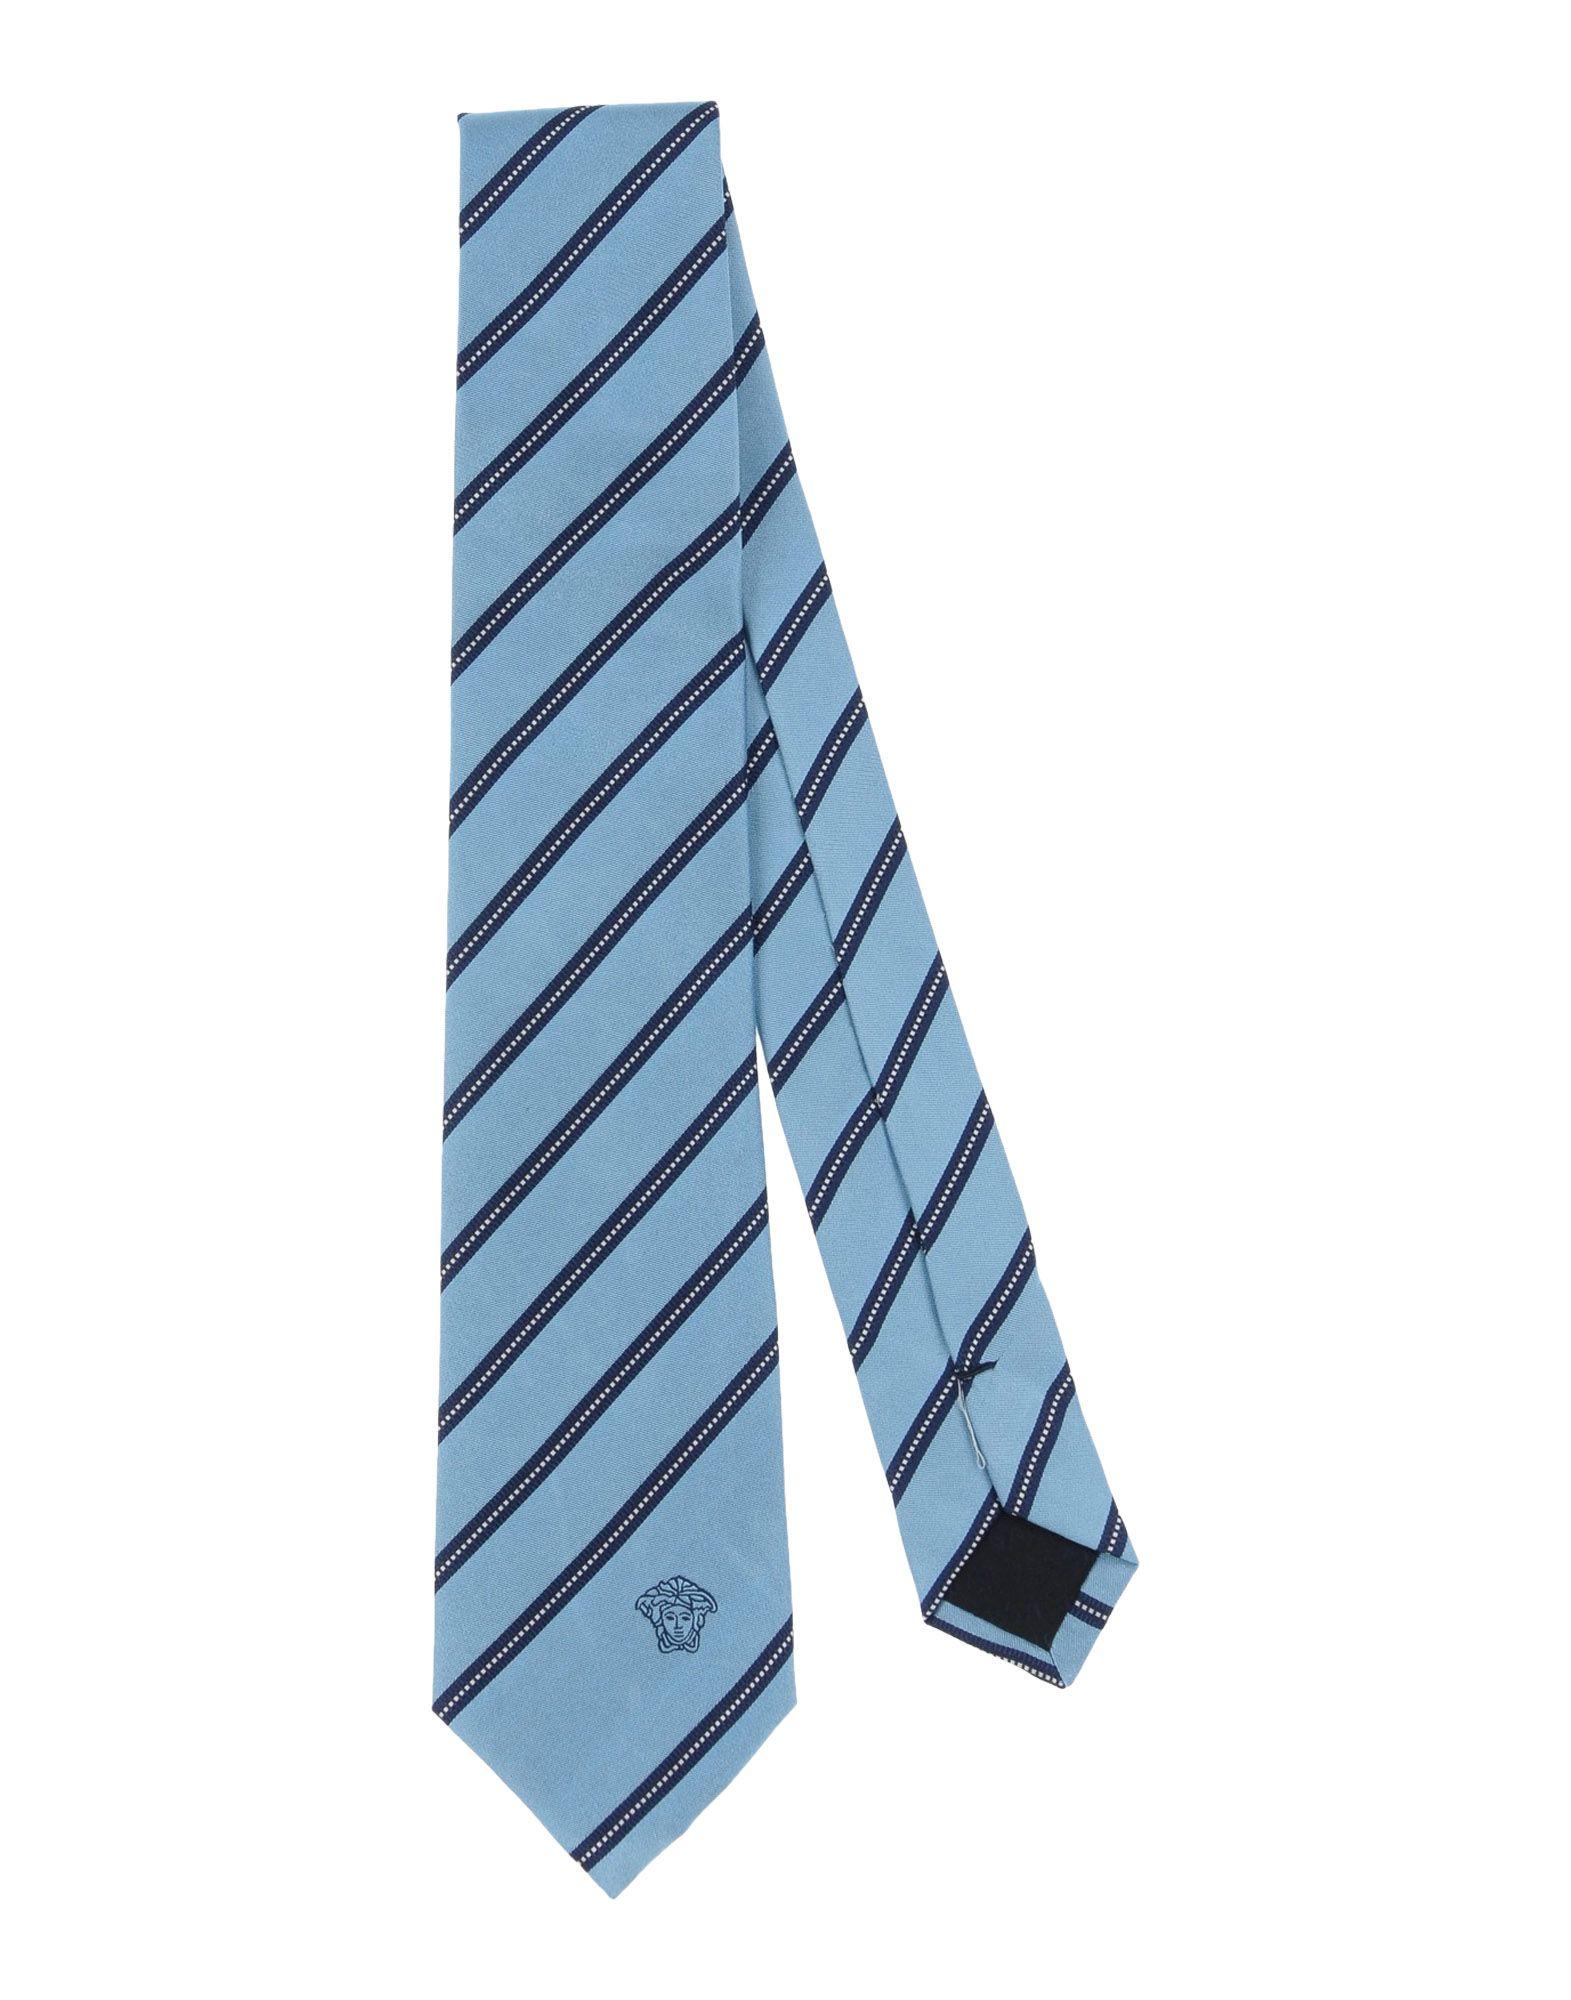 VERSACE Галстук versace бордовый галстук в клетку внизу с логотипом versace 821752 page 2